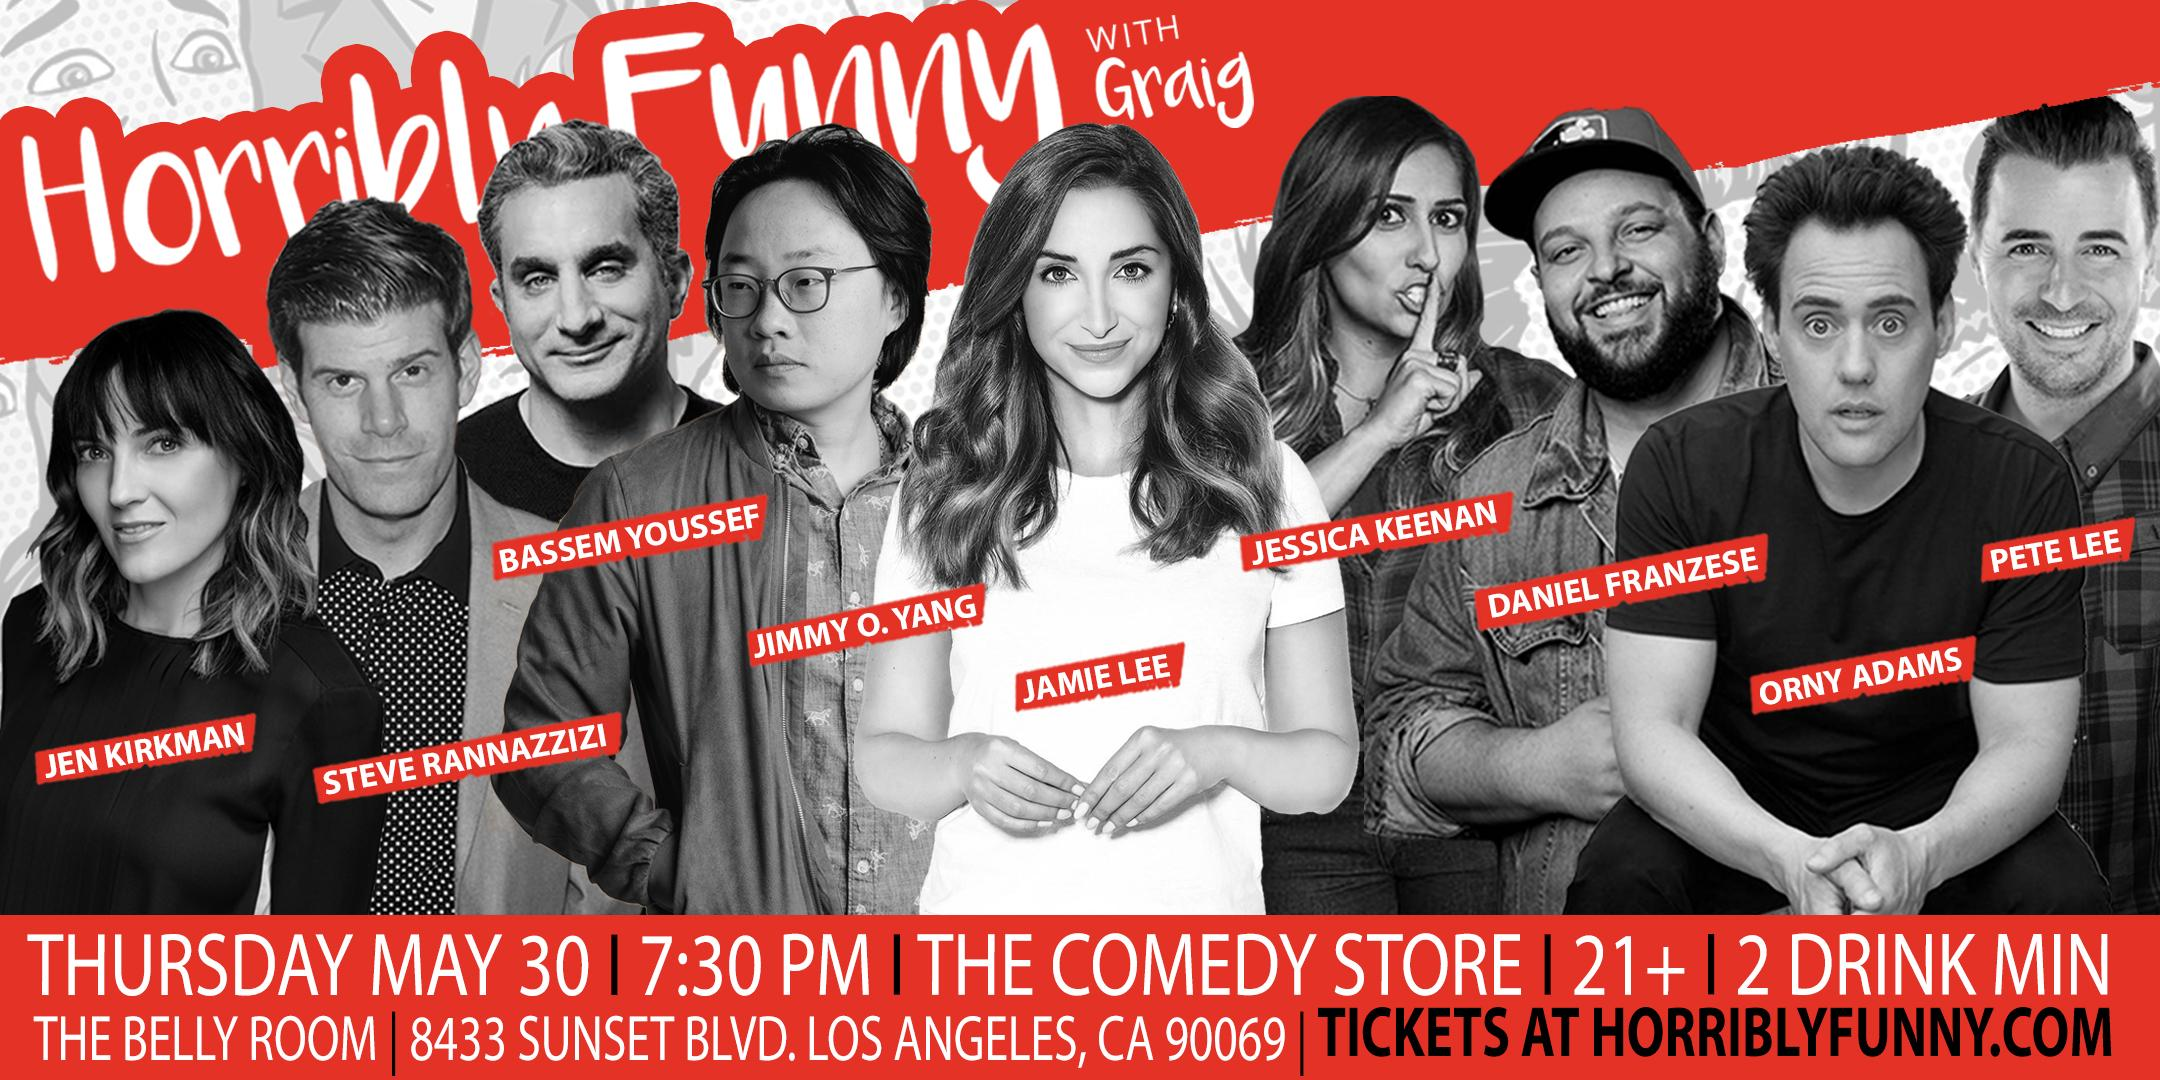 Horribly Funny- Bassem Youssef, Steve Rannazzisi, Jamie Lee, Orny Adams